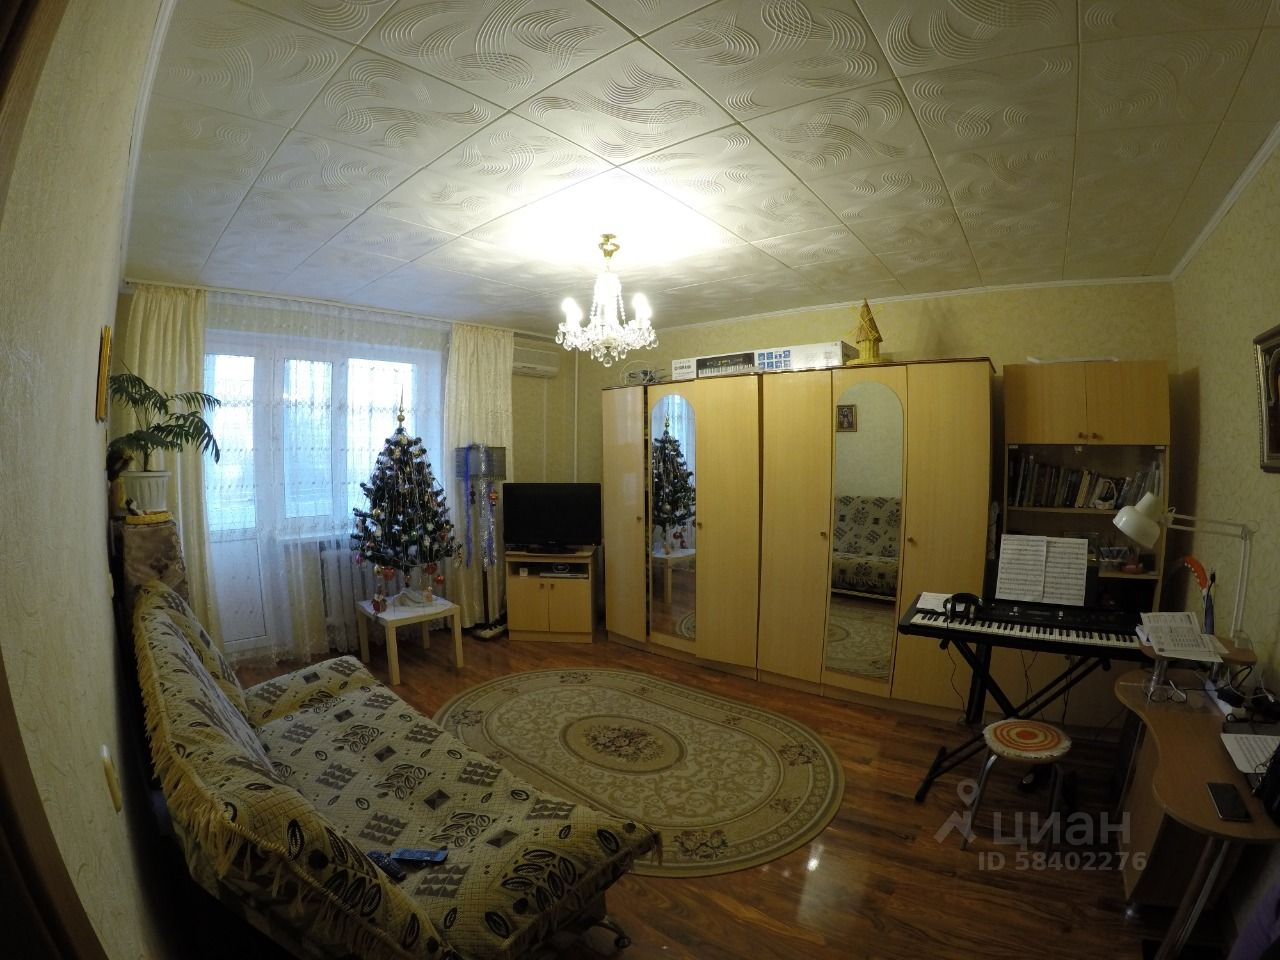 Продаю однокомнатную квартиру 37.7м² ул. Ленина, 163, Анапа, Краснодарский край - база ЦИАН, объявление 240932405